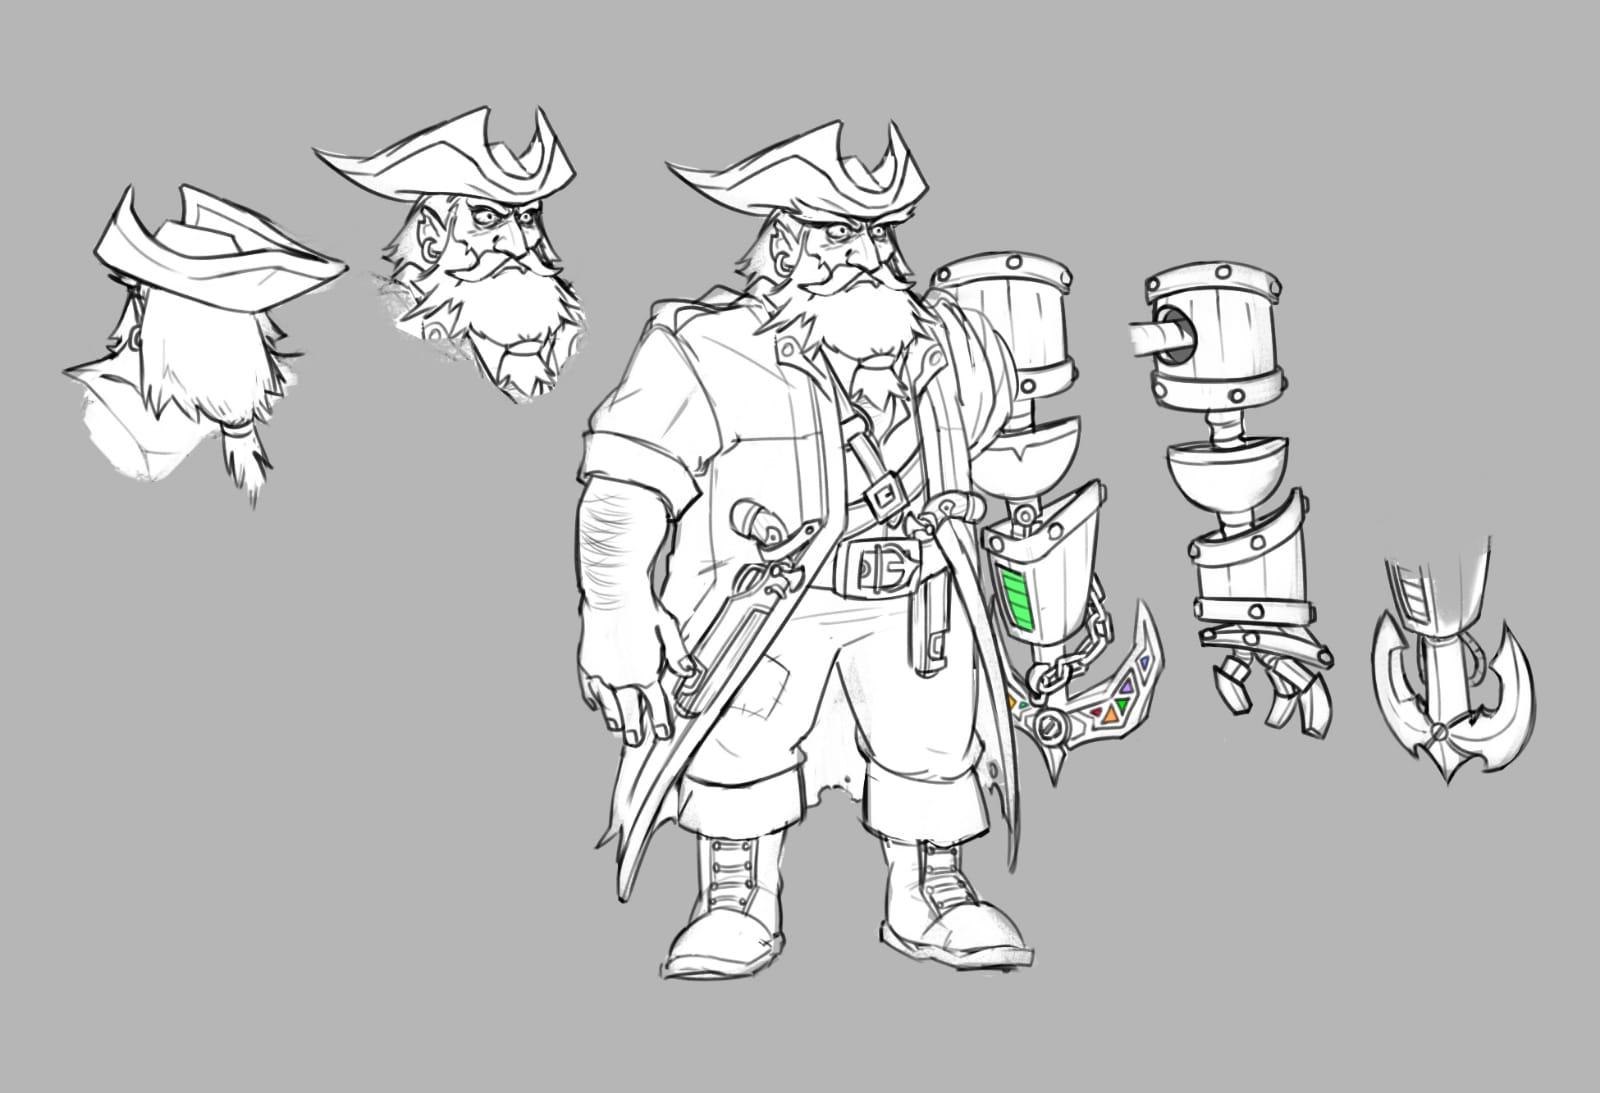 Pirate captain concept art